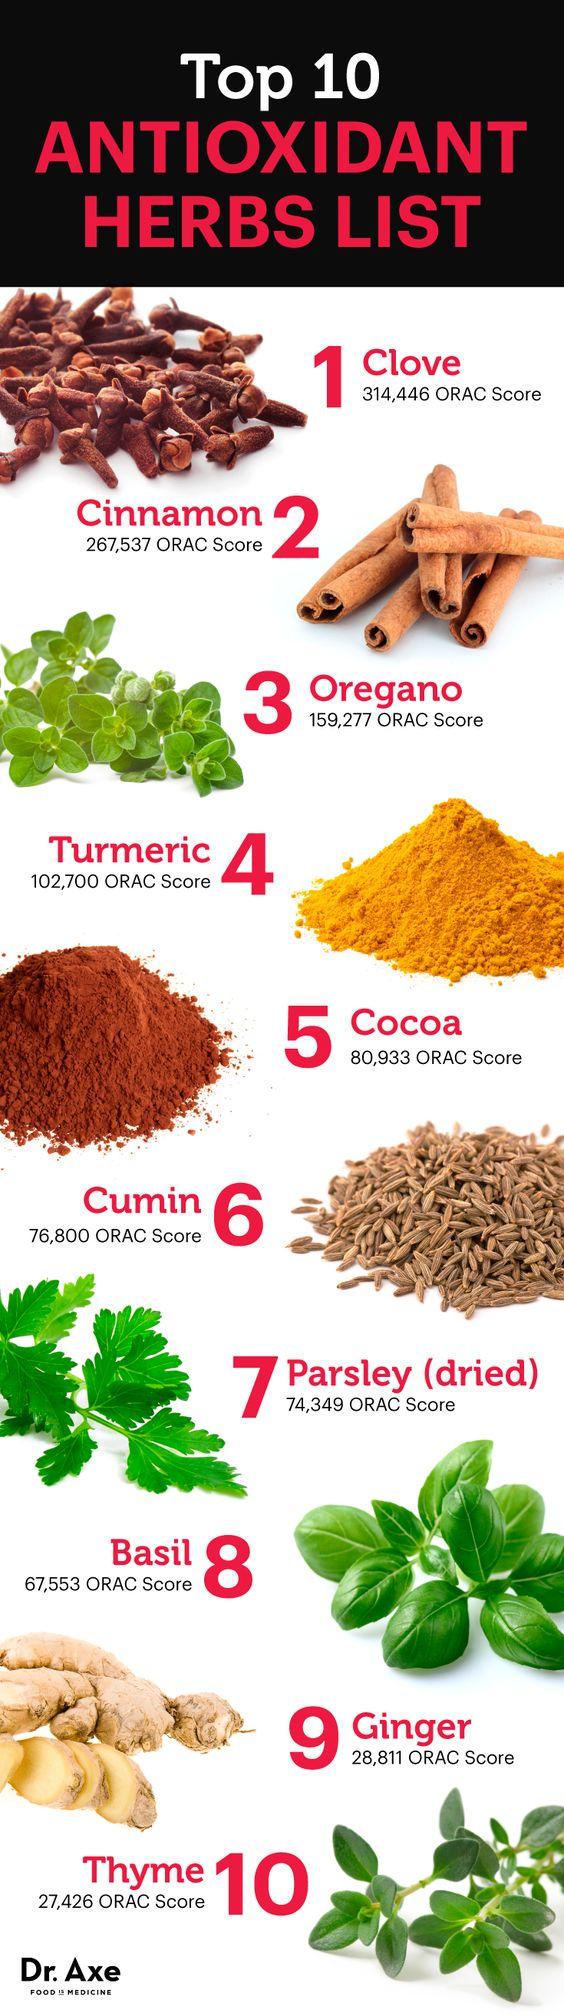 Top 10 High Antioxidant Foods - DrAxe.com: